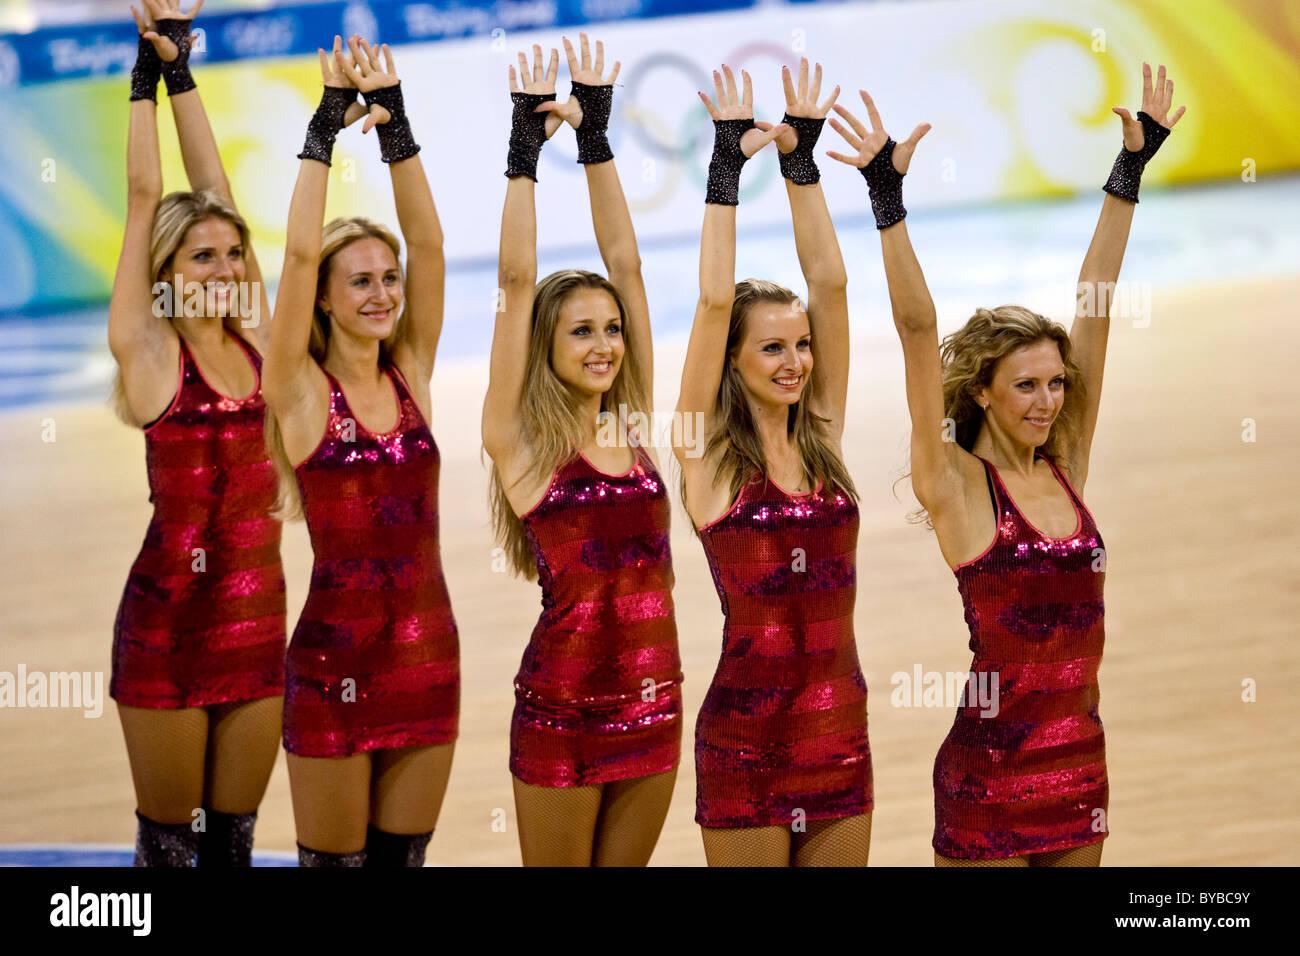 Cheerleaders At The Usa China Men S Basketball Game At The 2008 Stock Photo Alamy